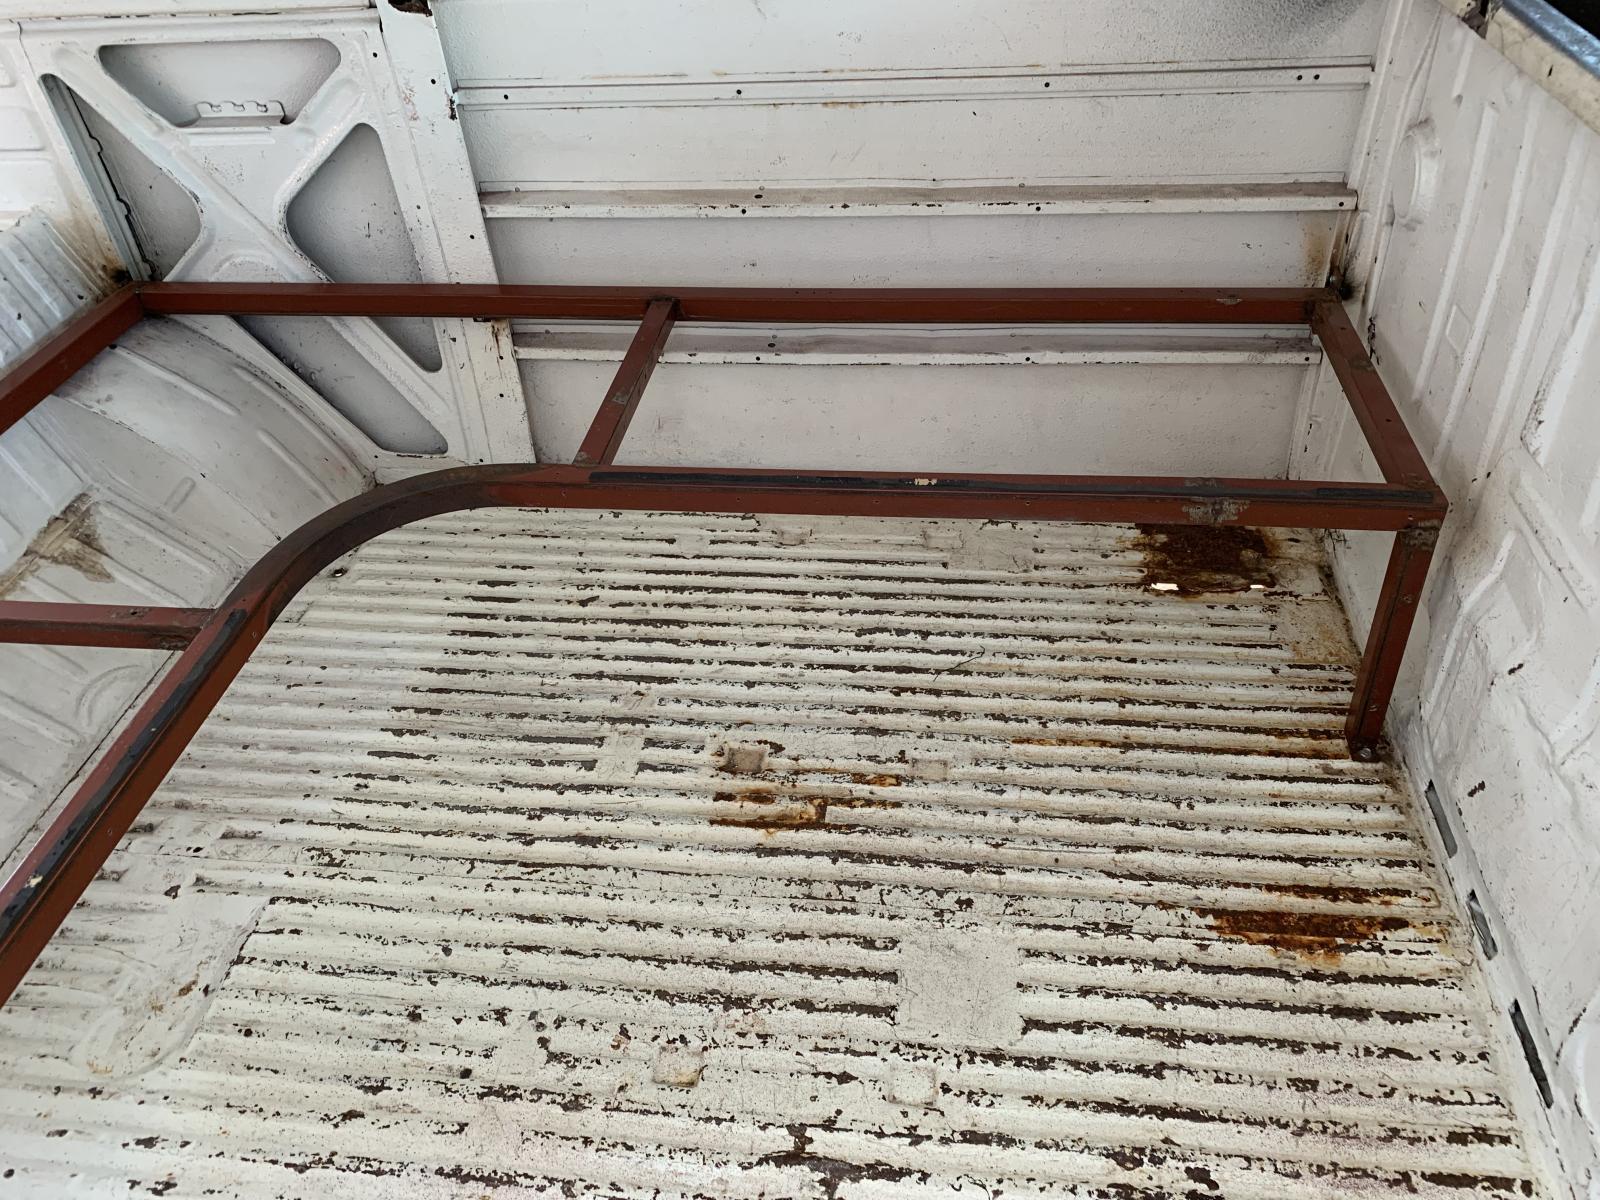 Custom Shelf or Seat Frame for Bay Window - Free in Part it Forward